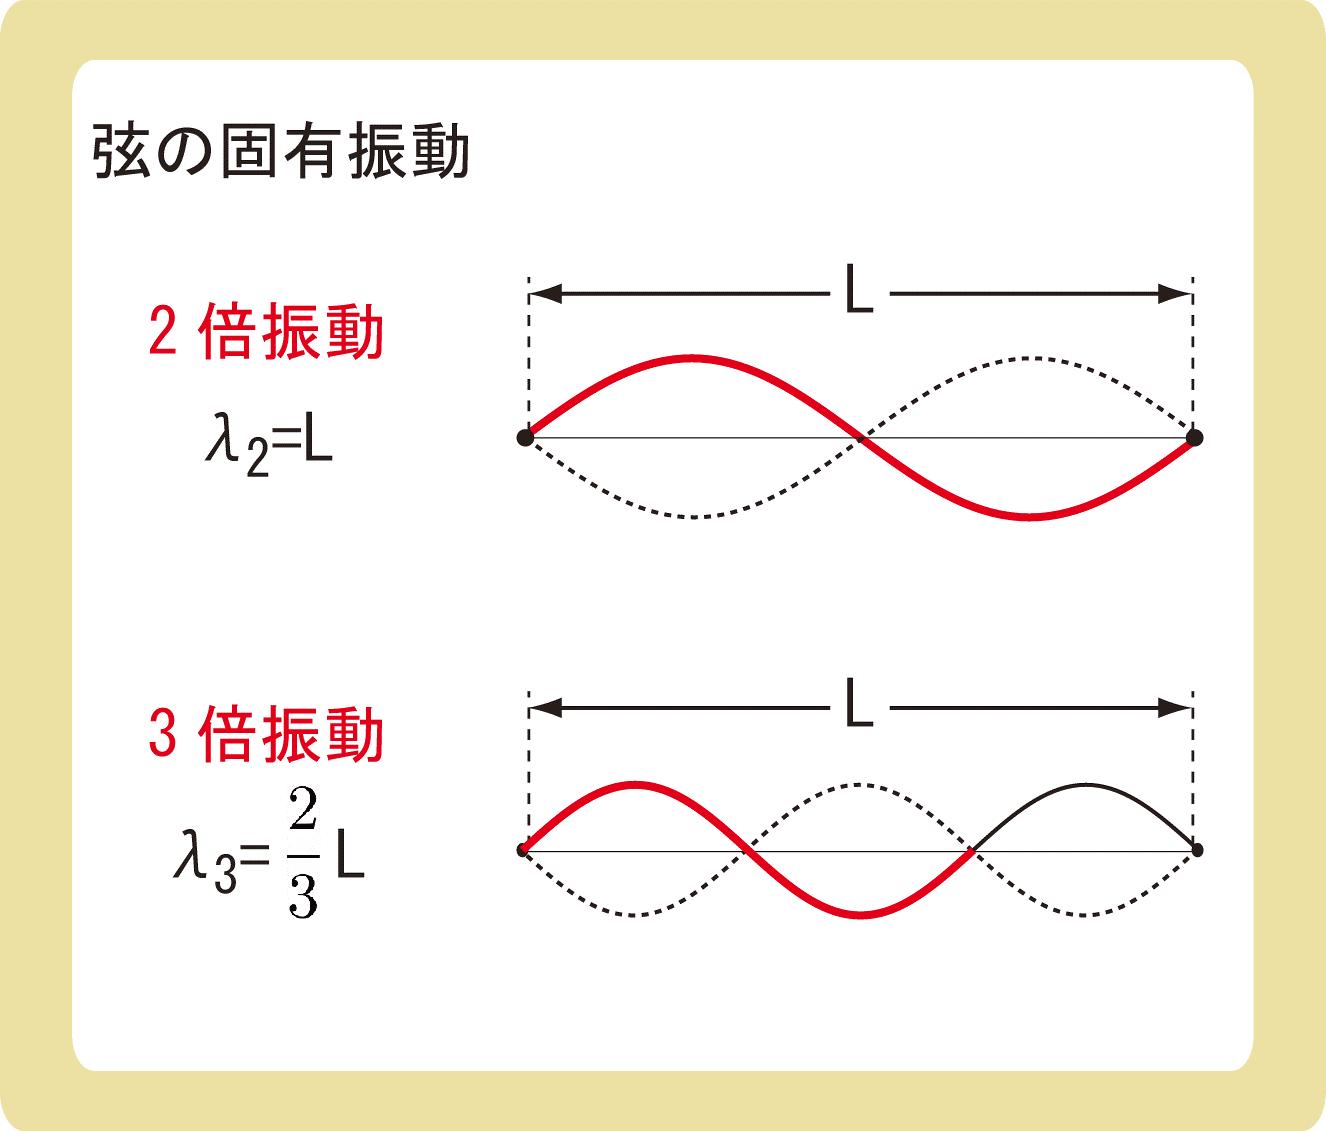 弦の固有振動_2倍振動と3倍振動